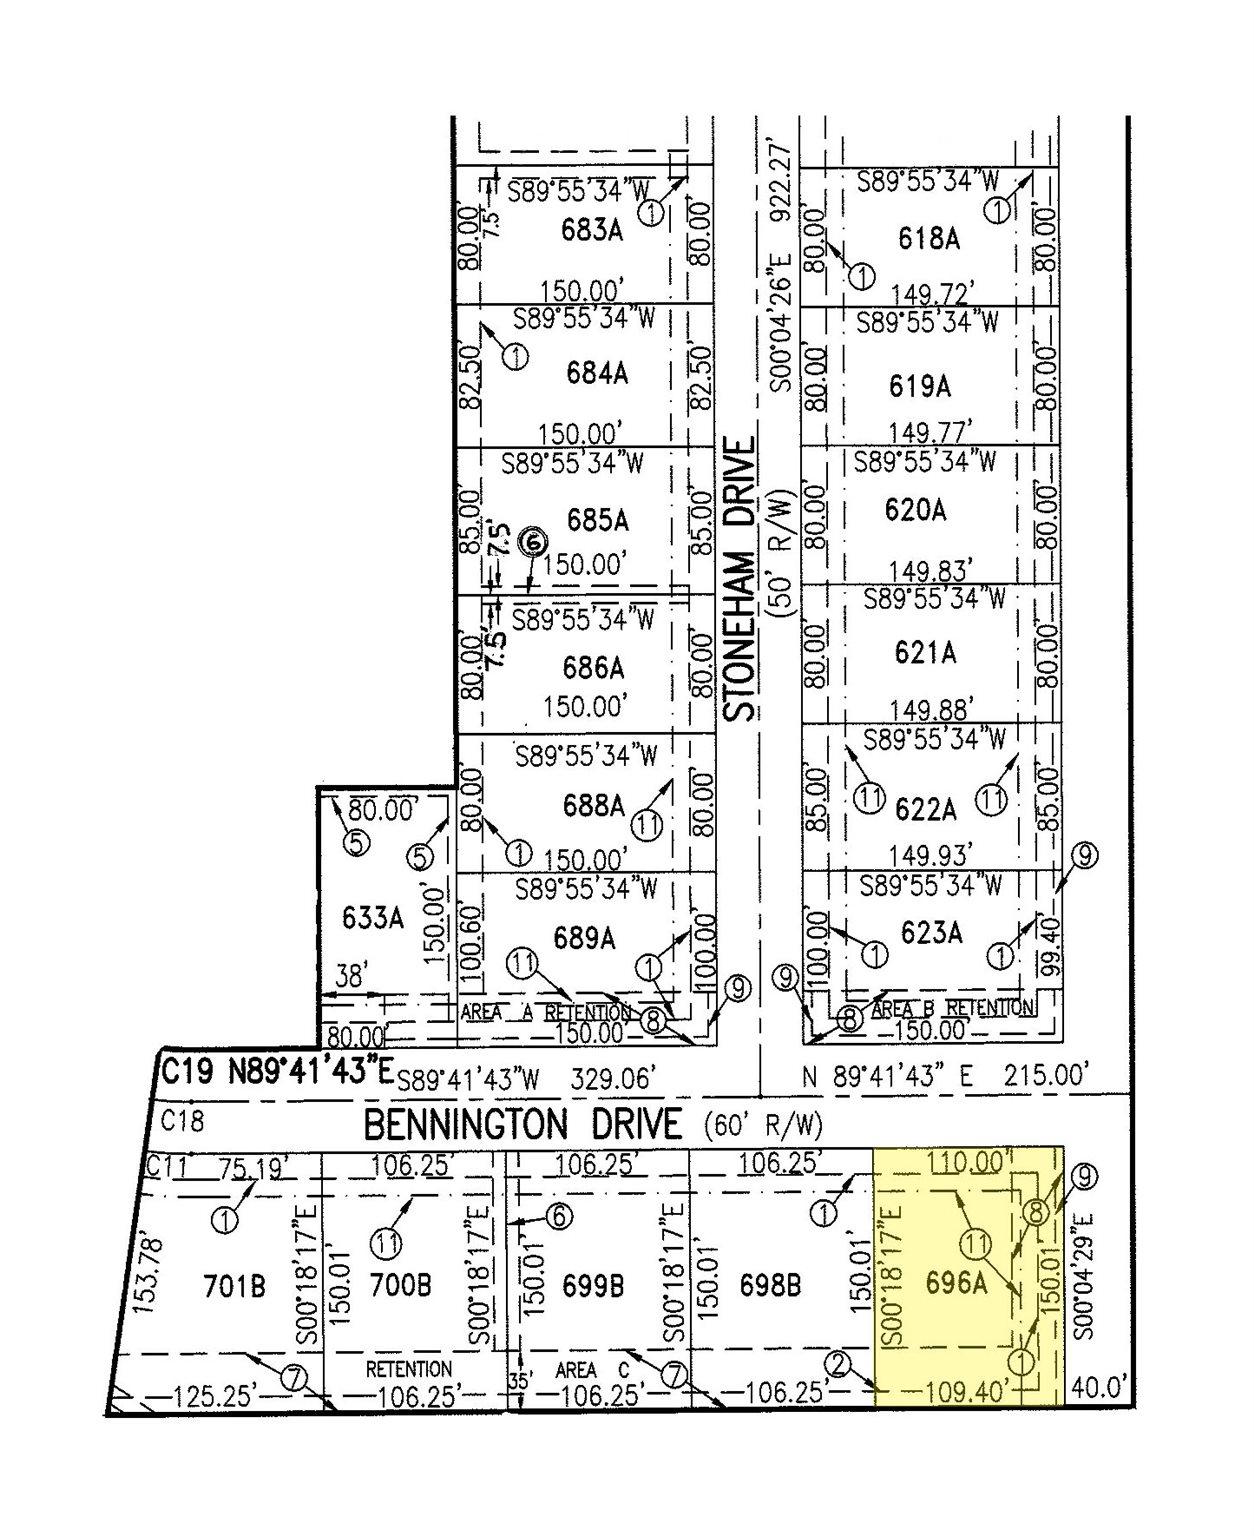 Bennington Mishawaka, IN 46544